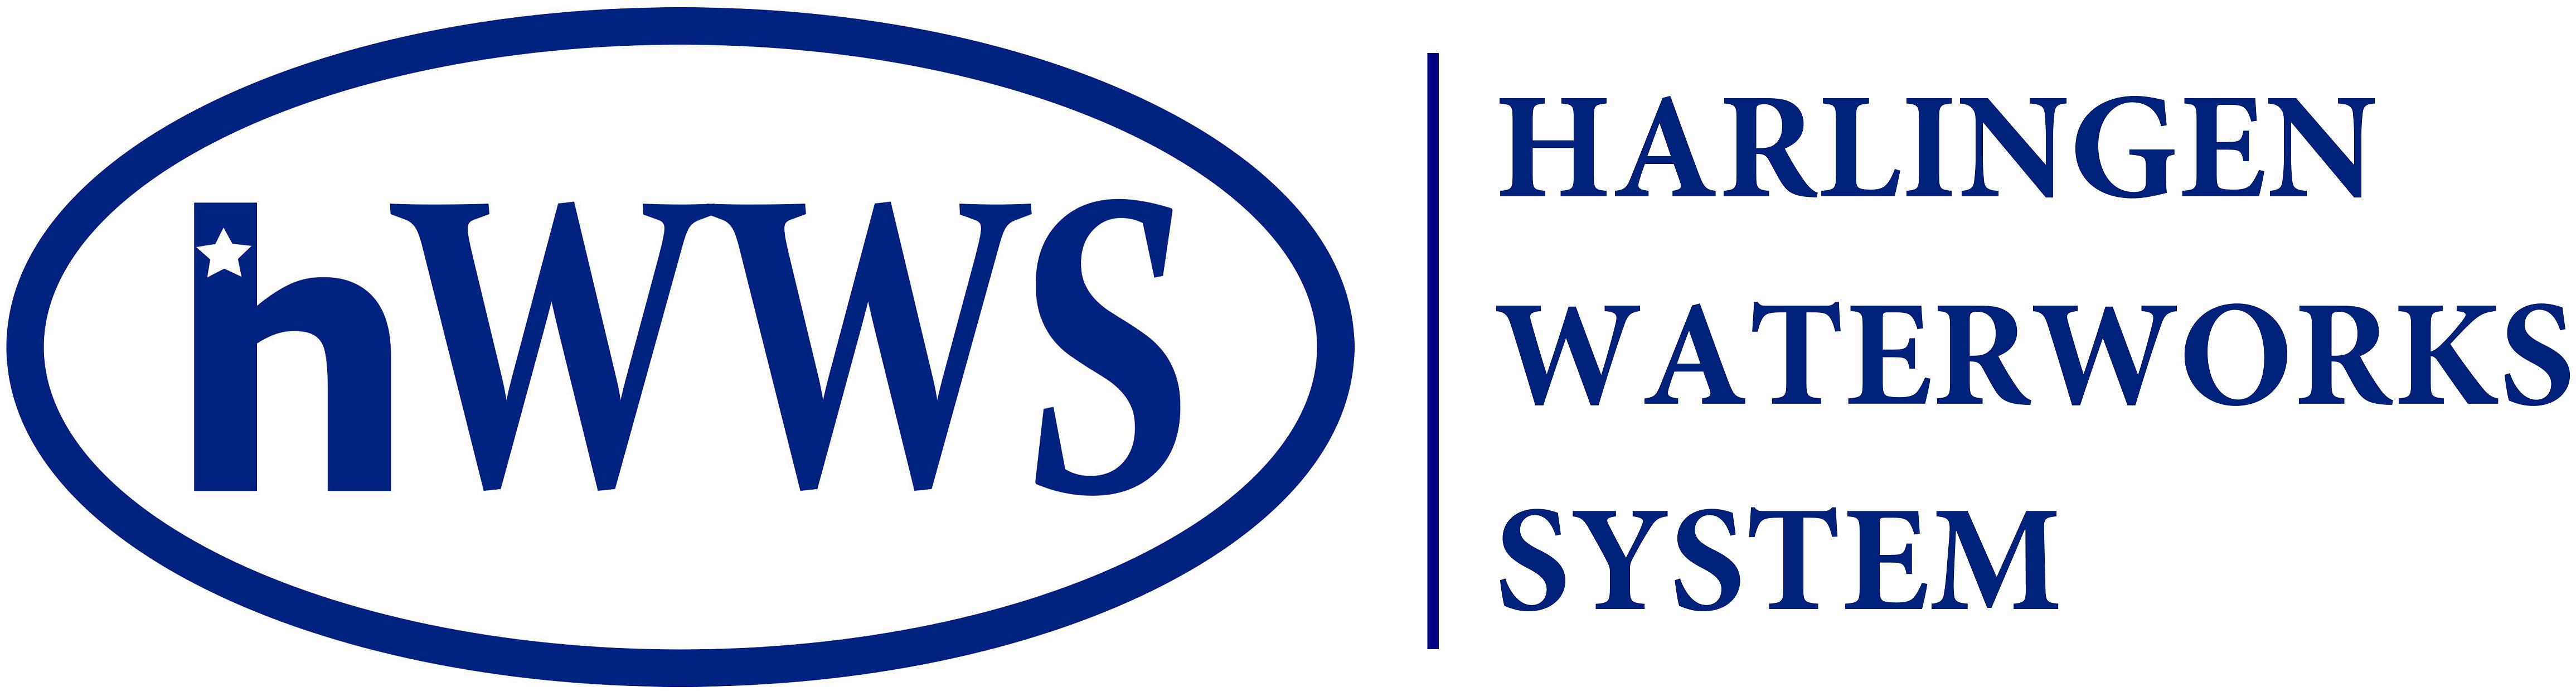 Harlingen Waterworks System Closed Bid| RFQ 19-016